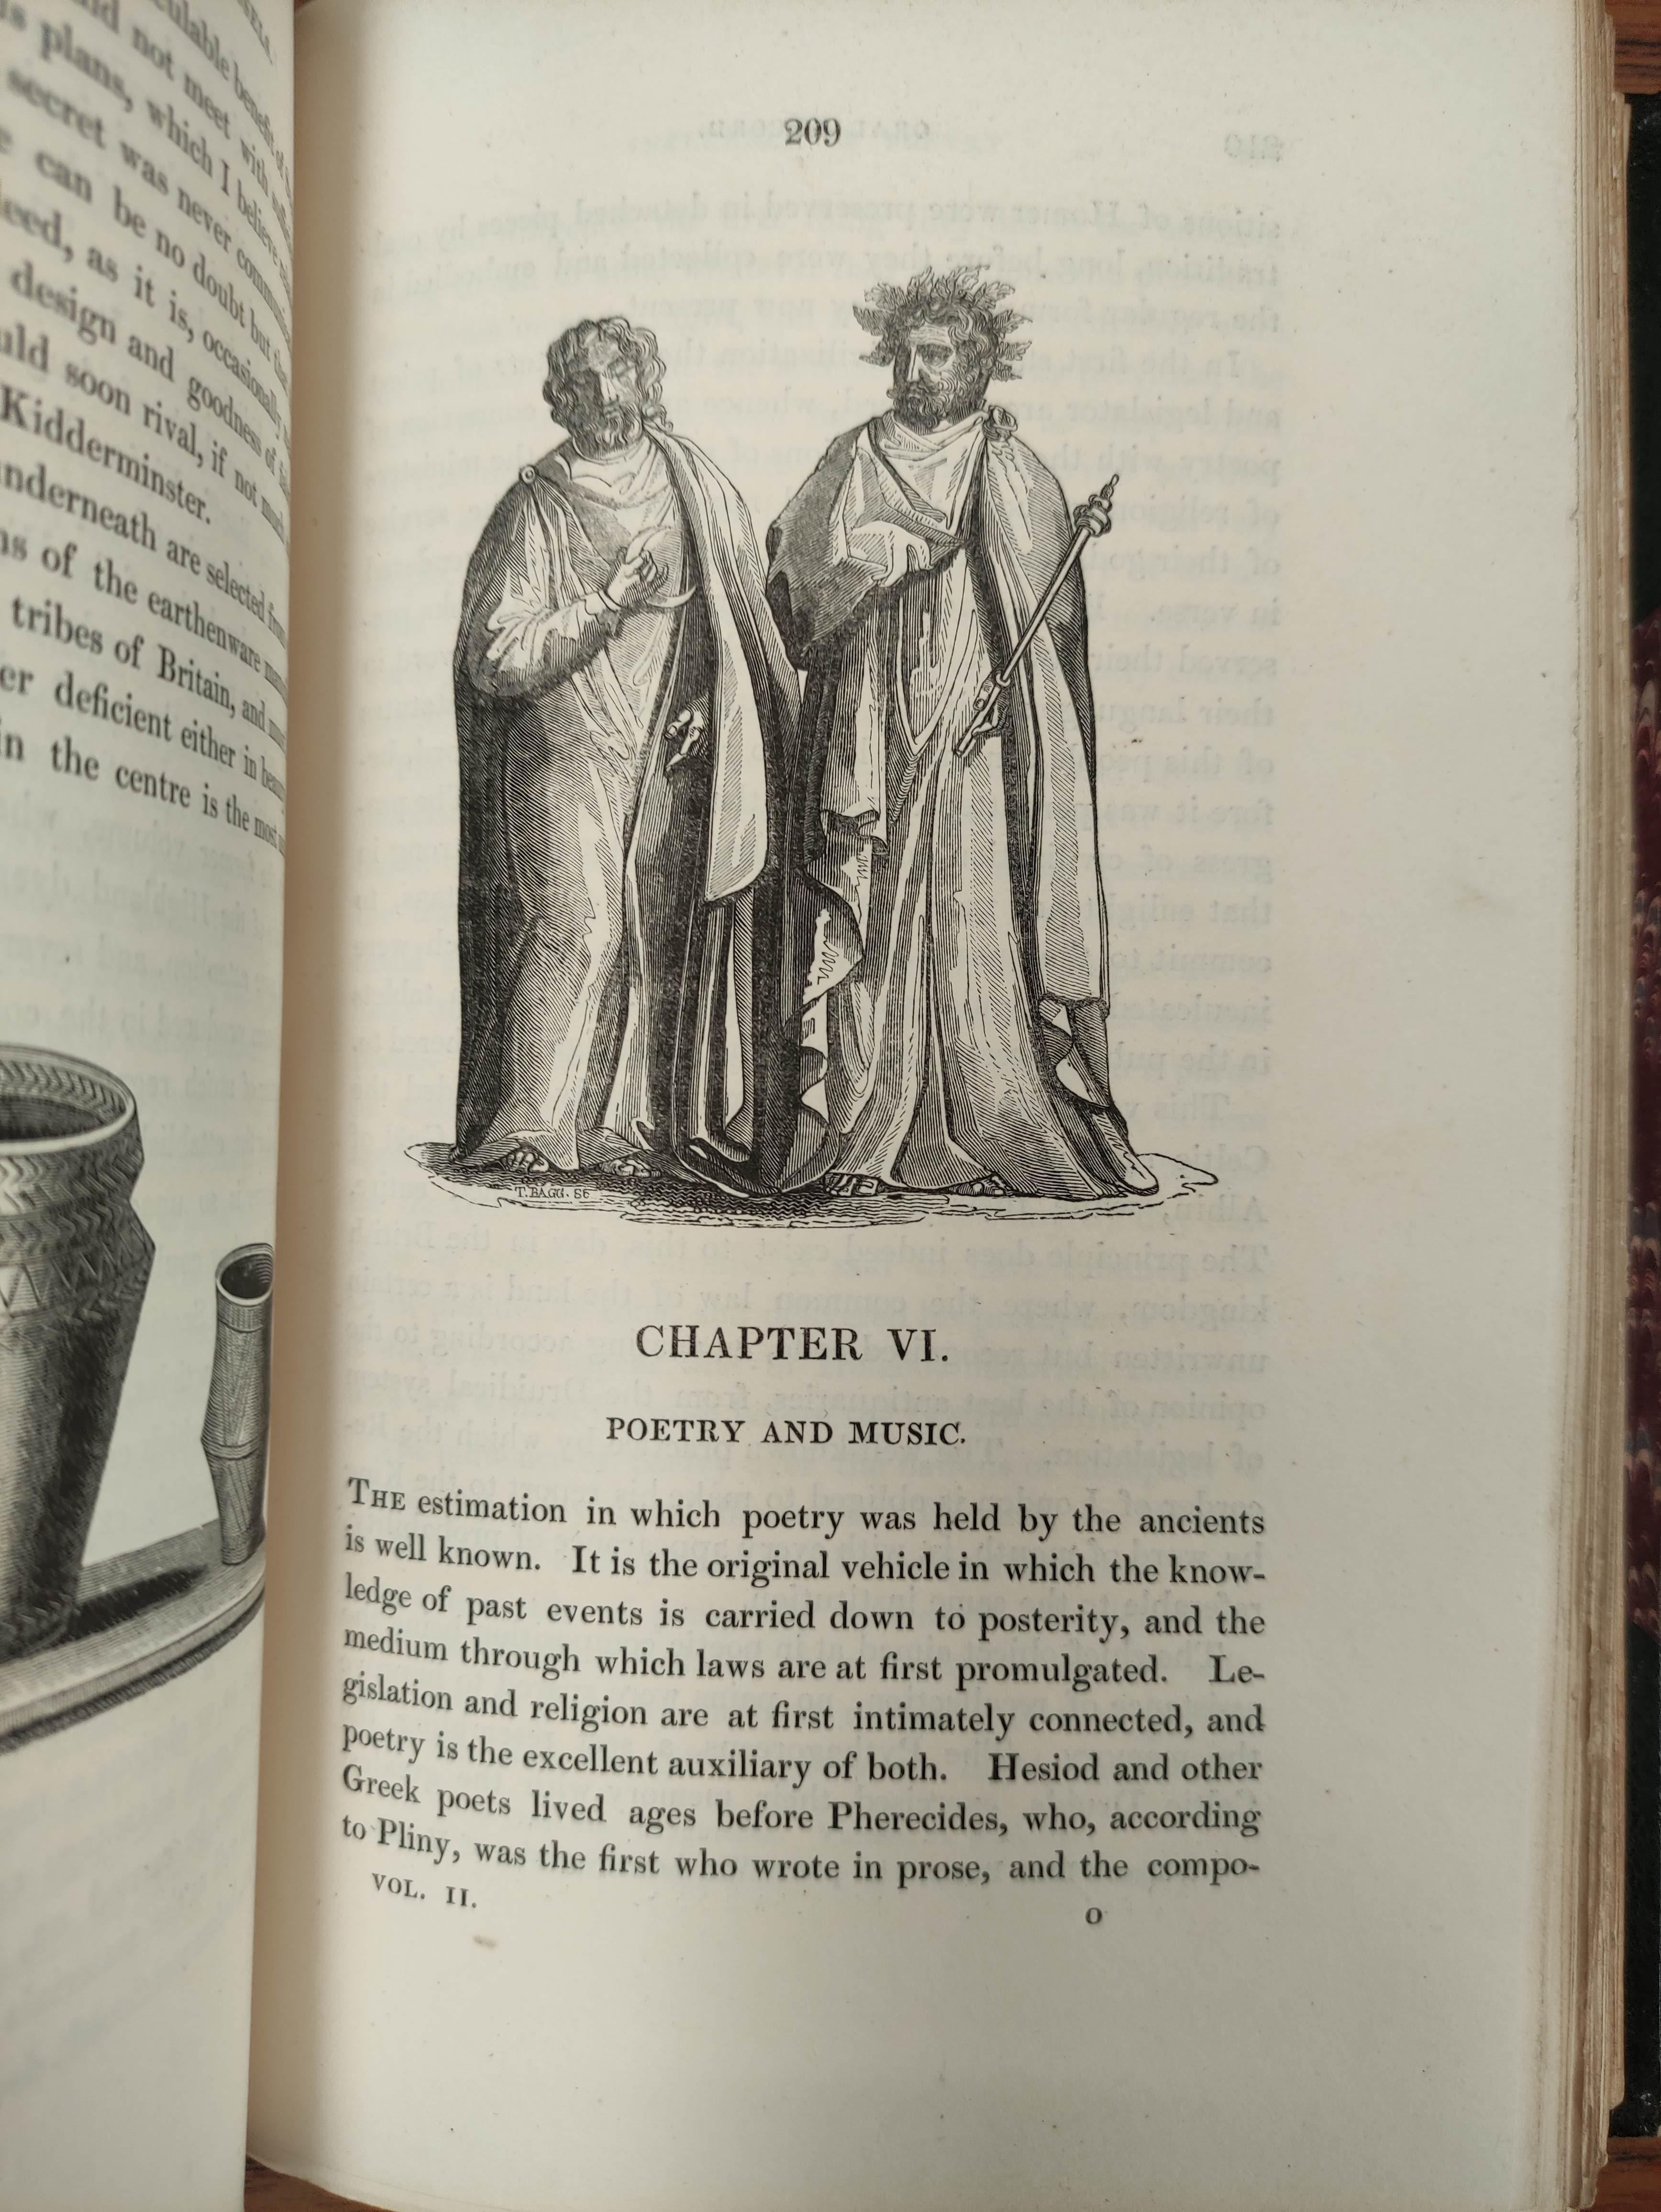 LOGAN JAMES.The Scottish Gael. 2 vols. Col. frontis & text illus. Half green morocco. A nice - Image 10 of 10